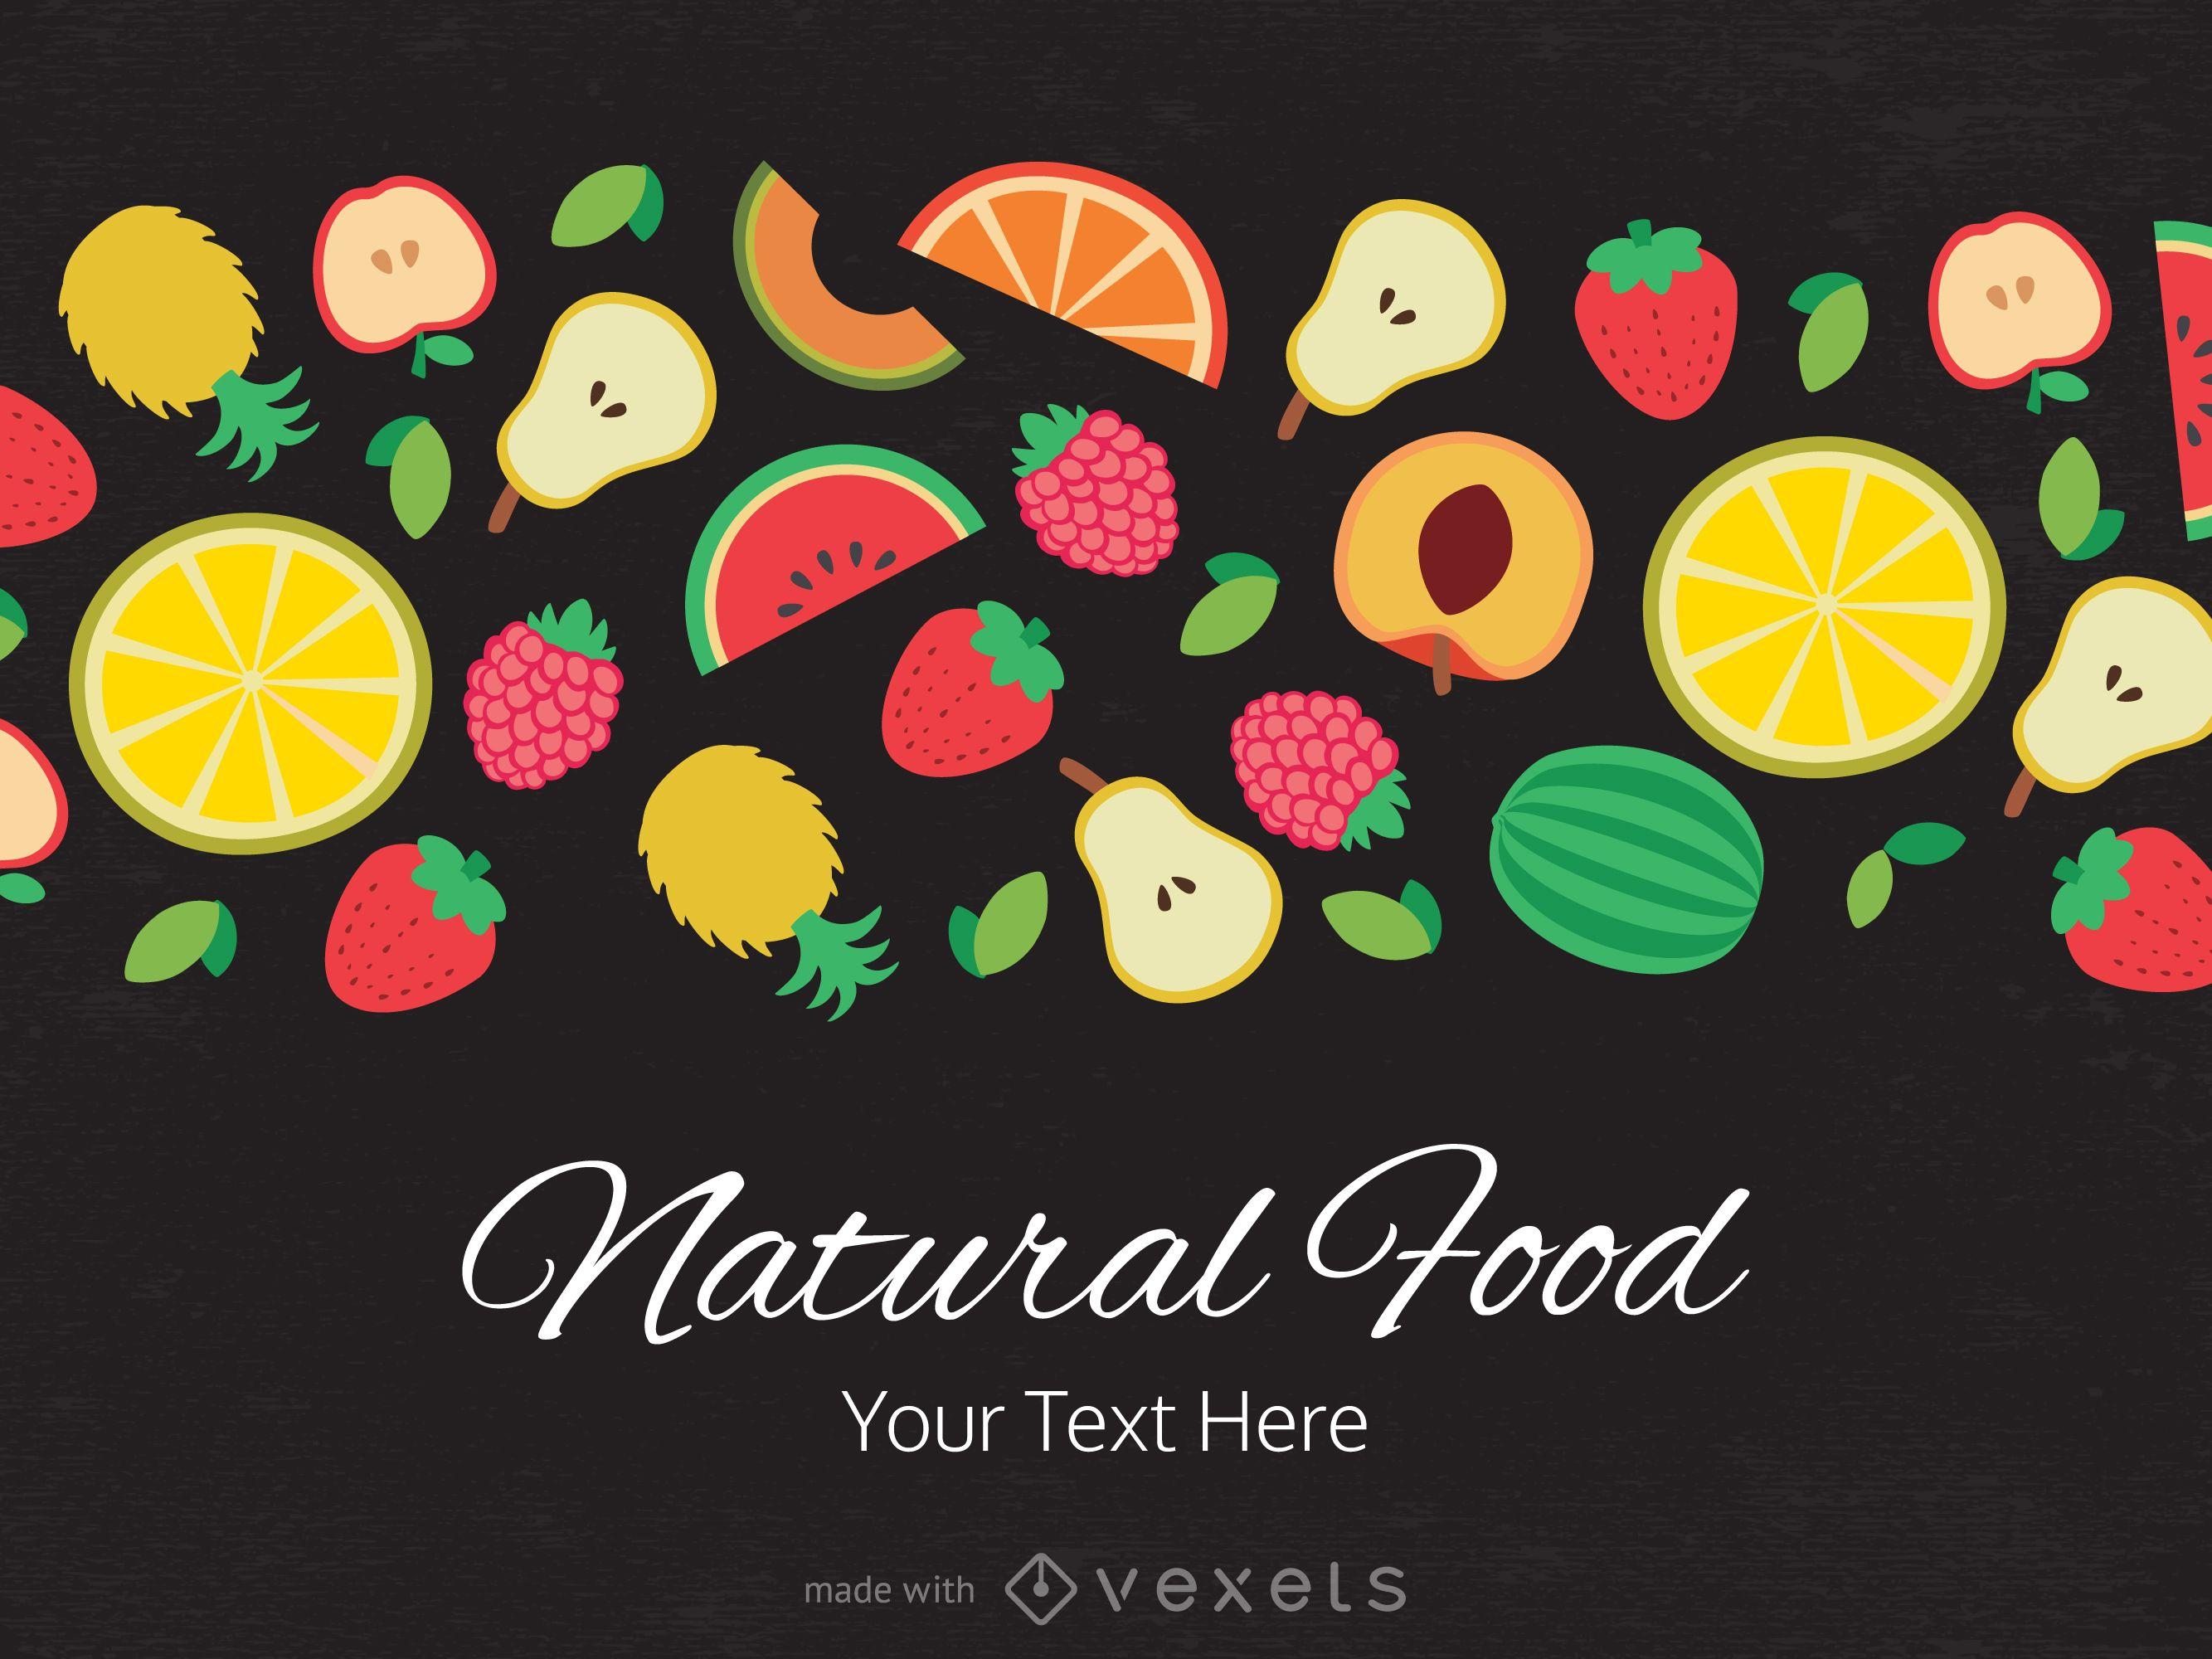 Flat fruits and vegetables poster maker